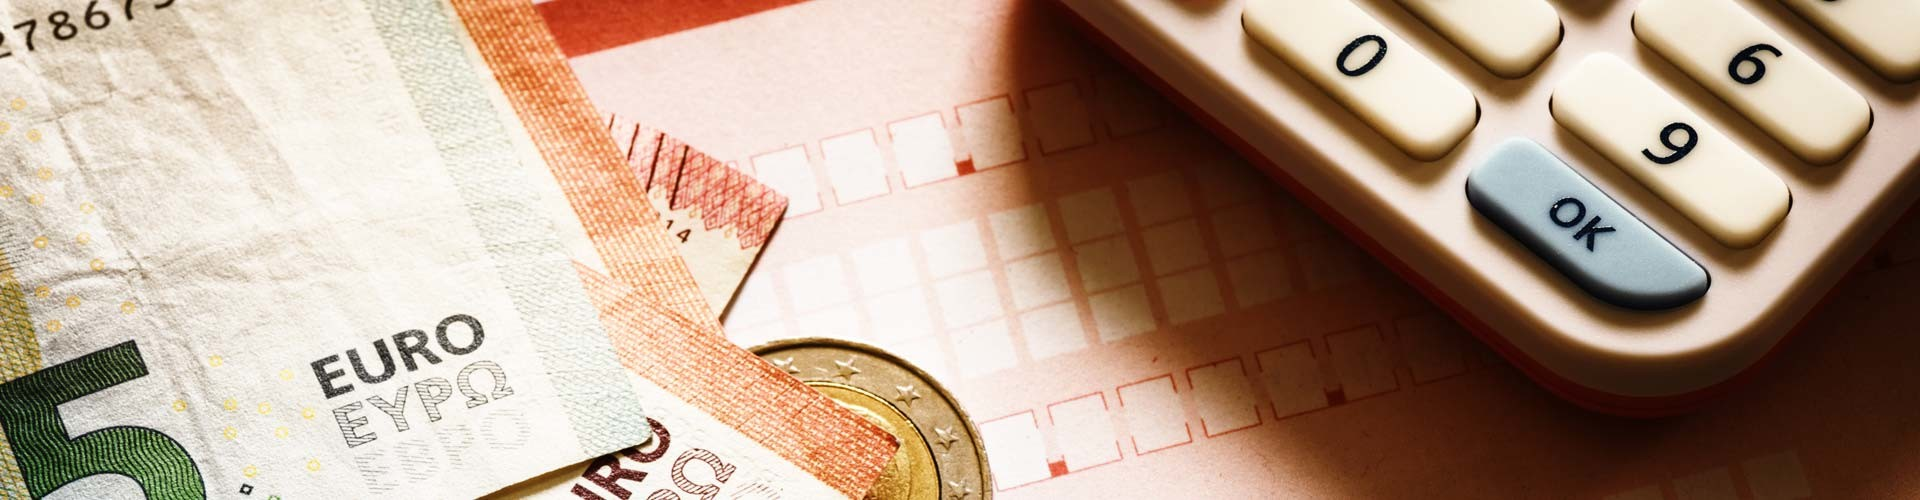 Taschenrechner, Banknoten © stock.adobe.com, Adobe Stock